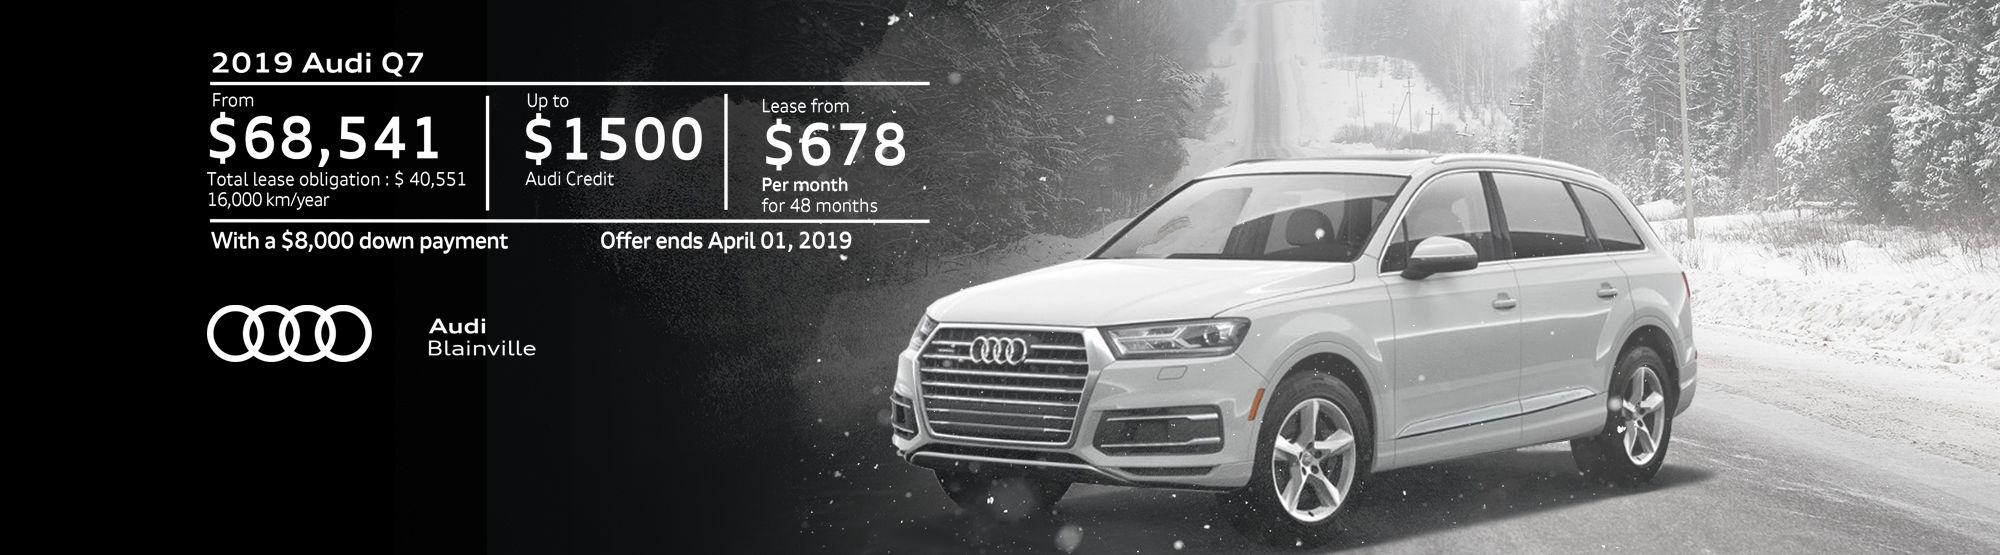 Audi Q7 March 2019